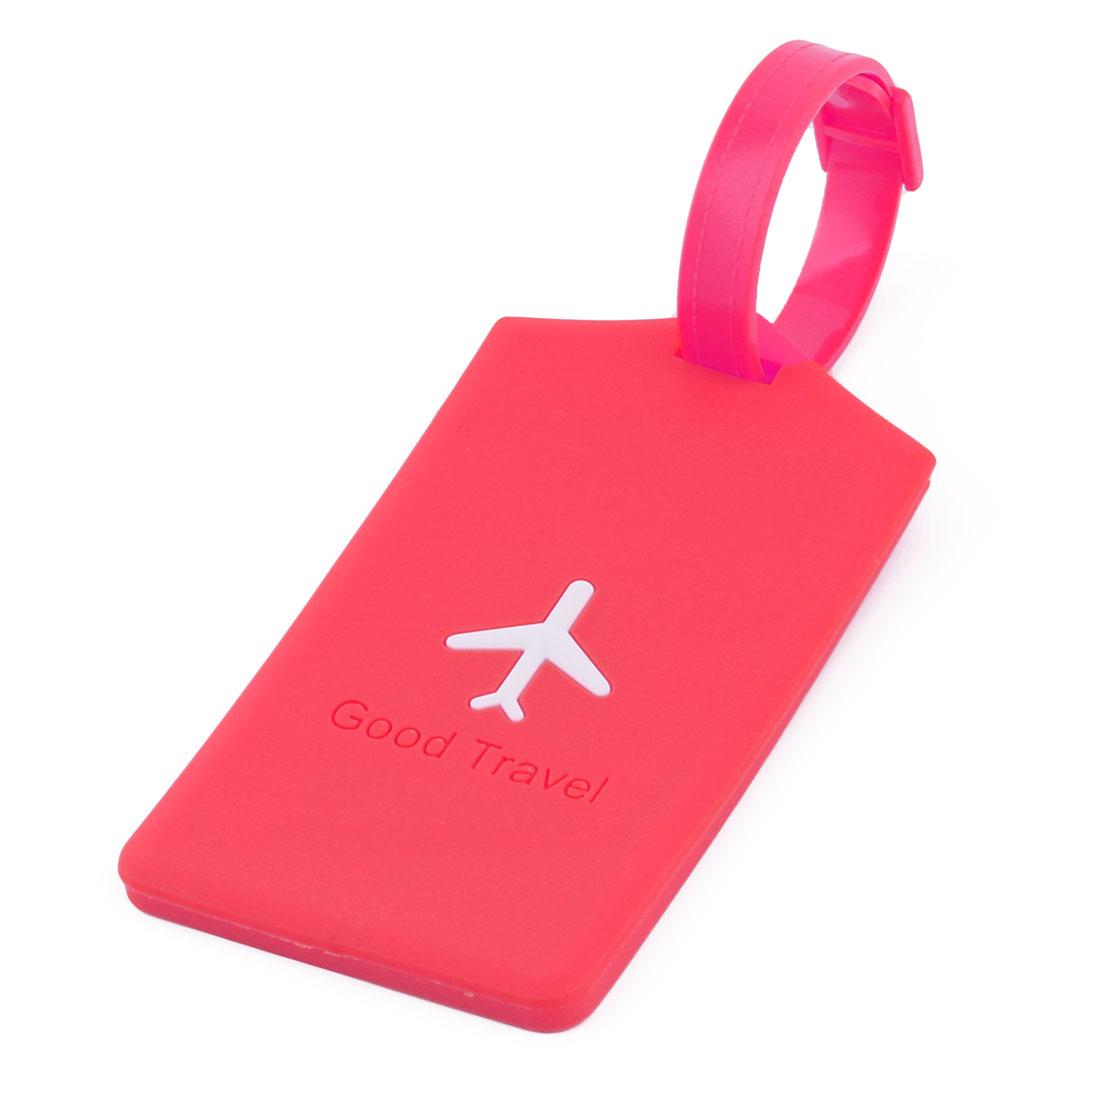 Silicone Rectangle Airplane Travel Suitcase Label Luggage Tag Name Address Card Holder Fuchsia